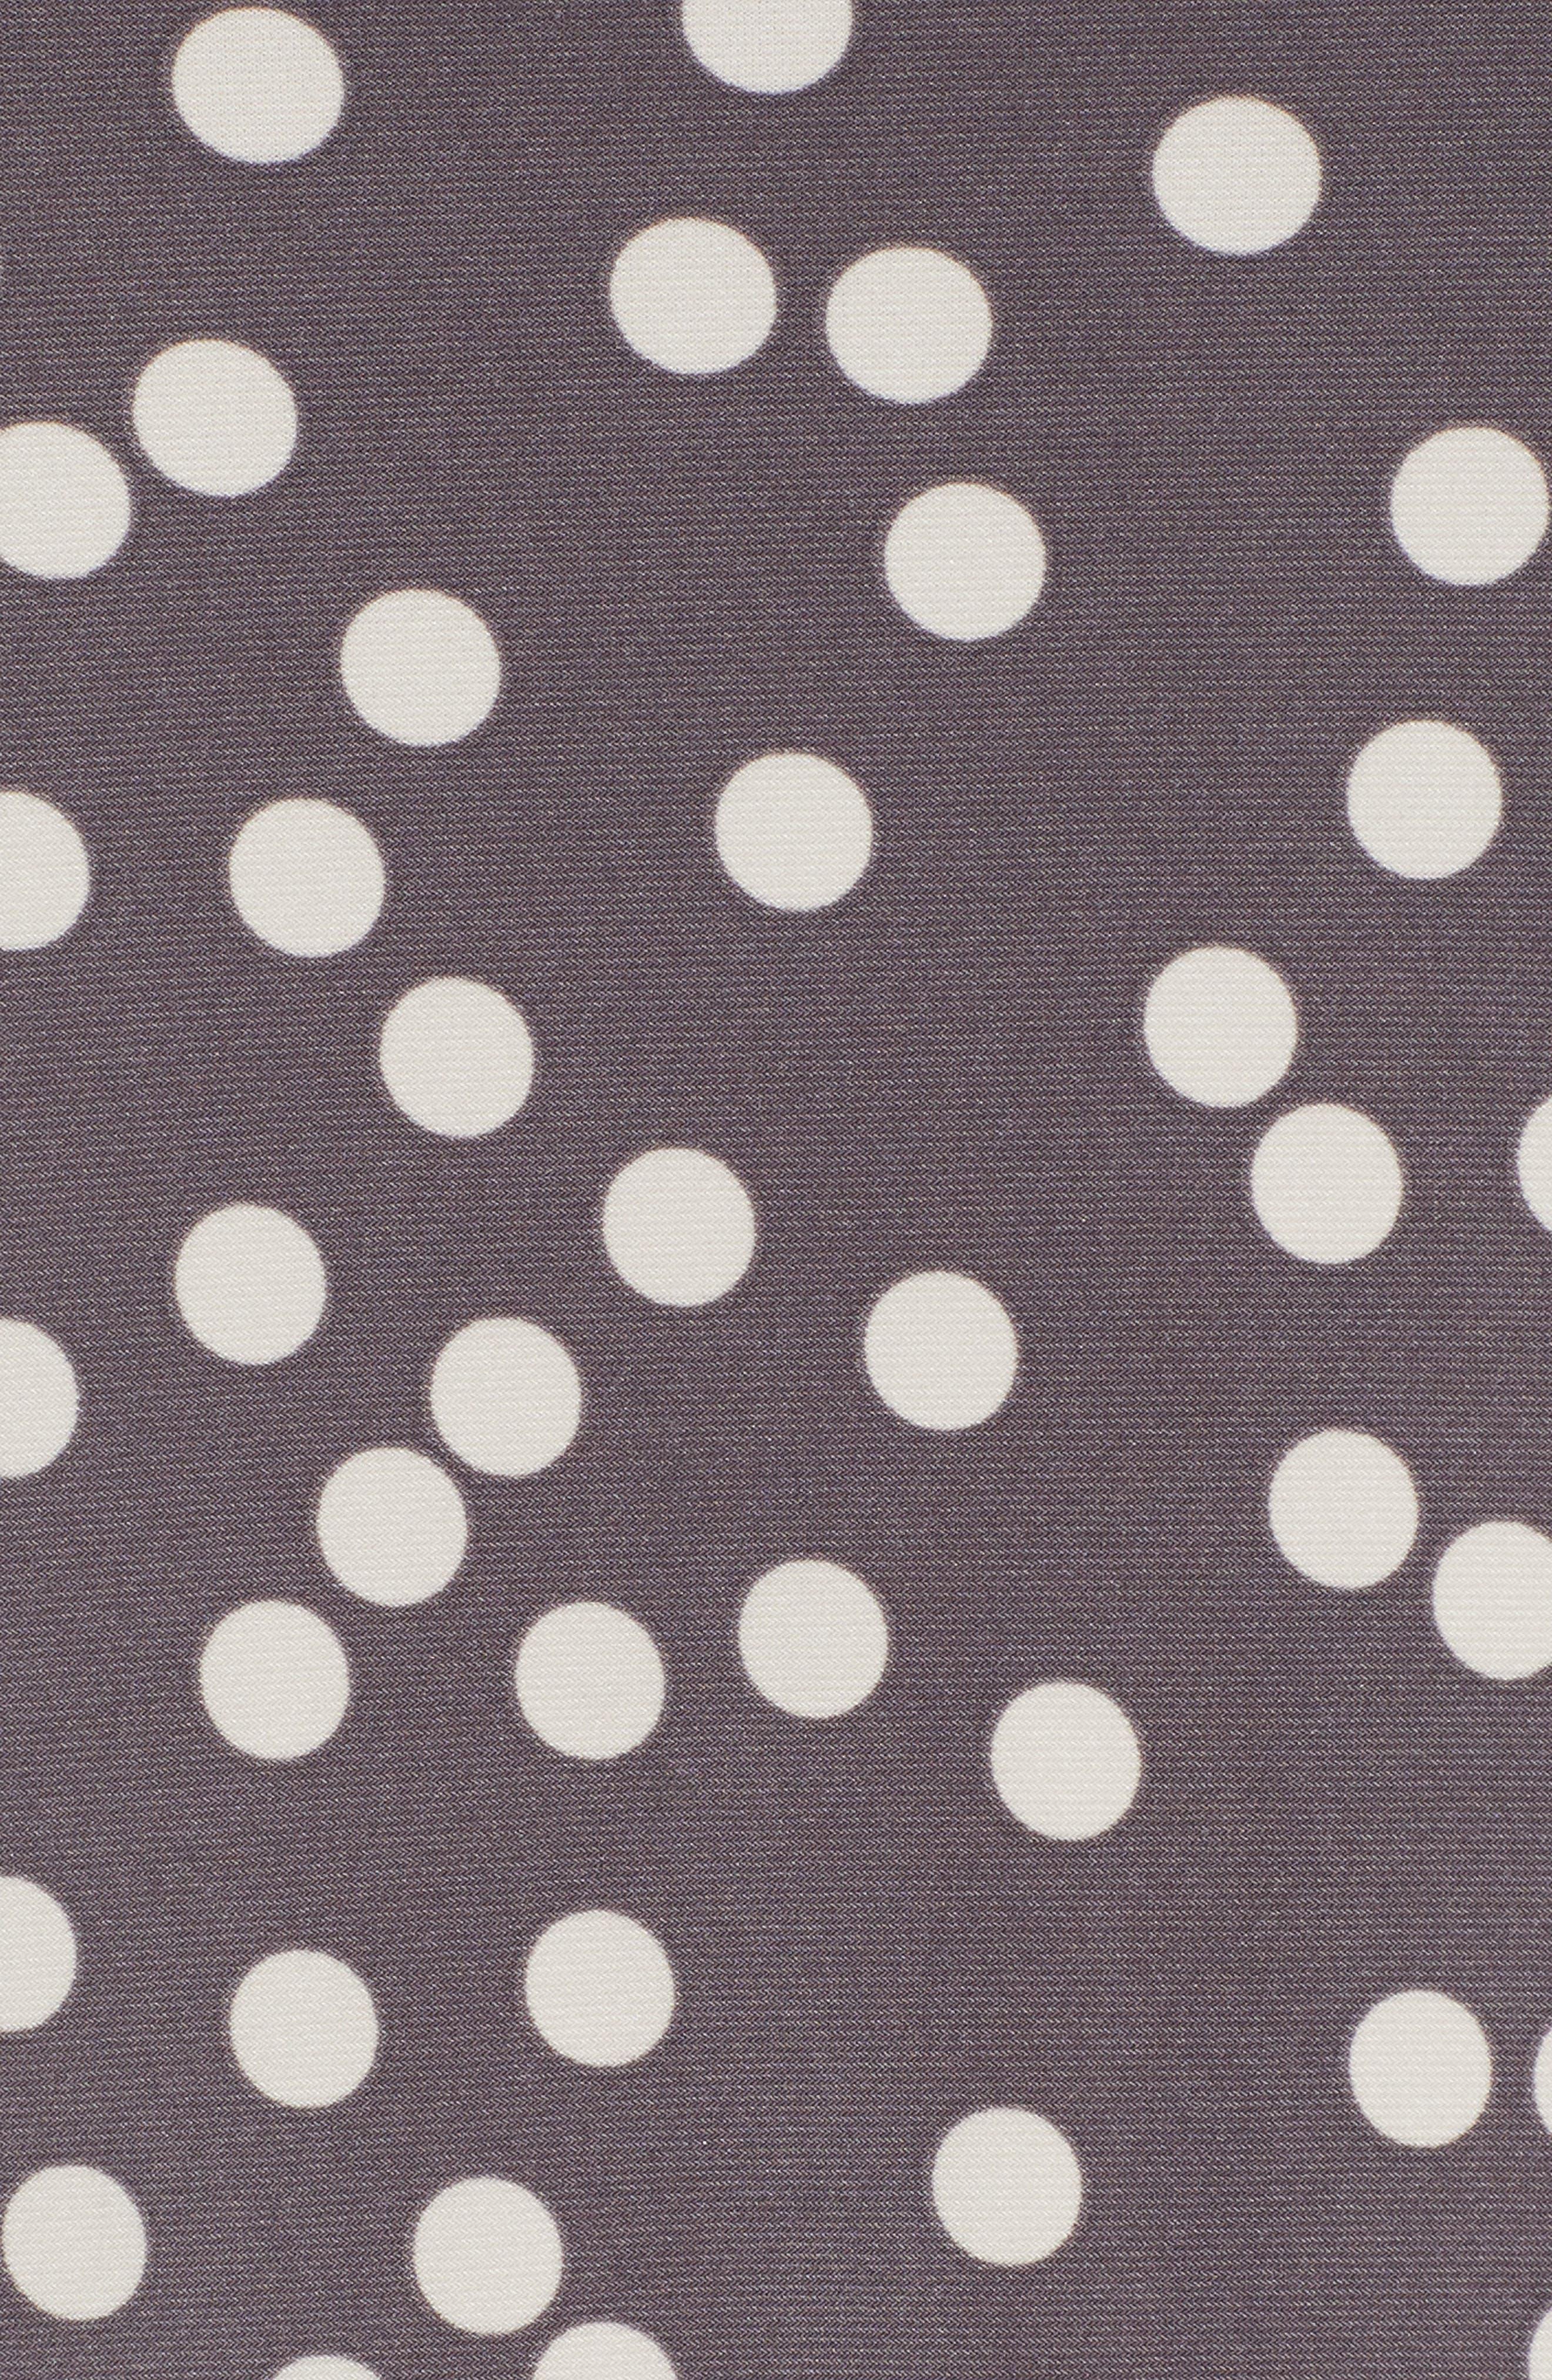 Dot Print Swing Dress,                             Alternate thumbnail 6, color,                             020